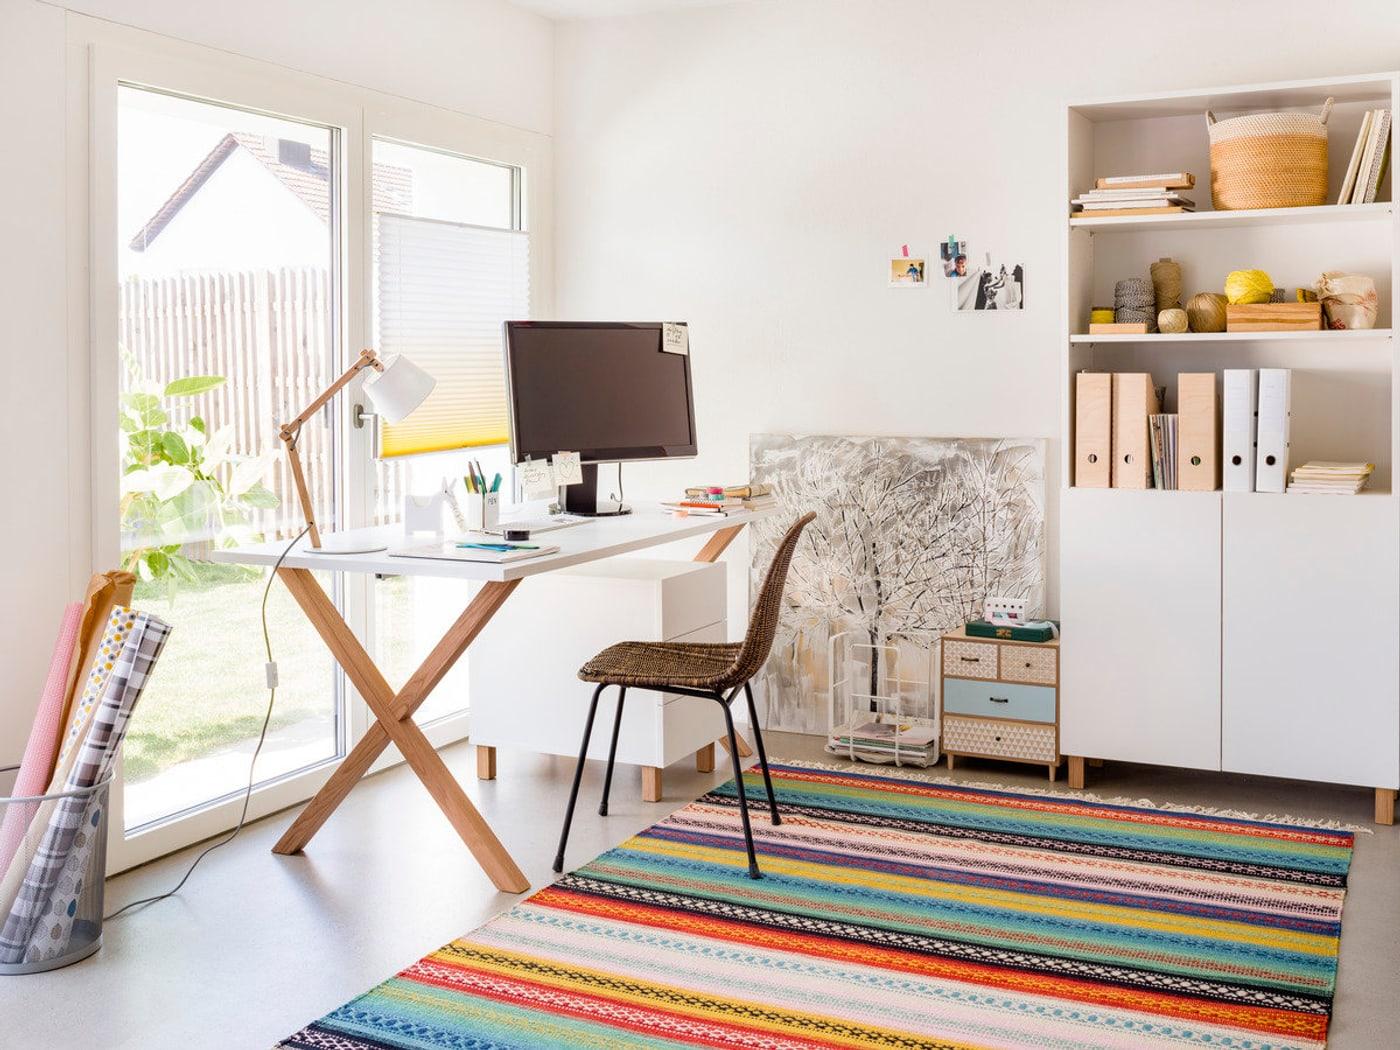 horizon plissee migros. Black Bedroom Furniture Sets. Home Design Ideas